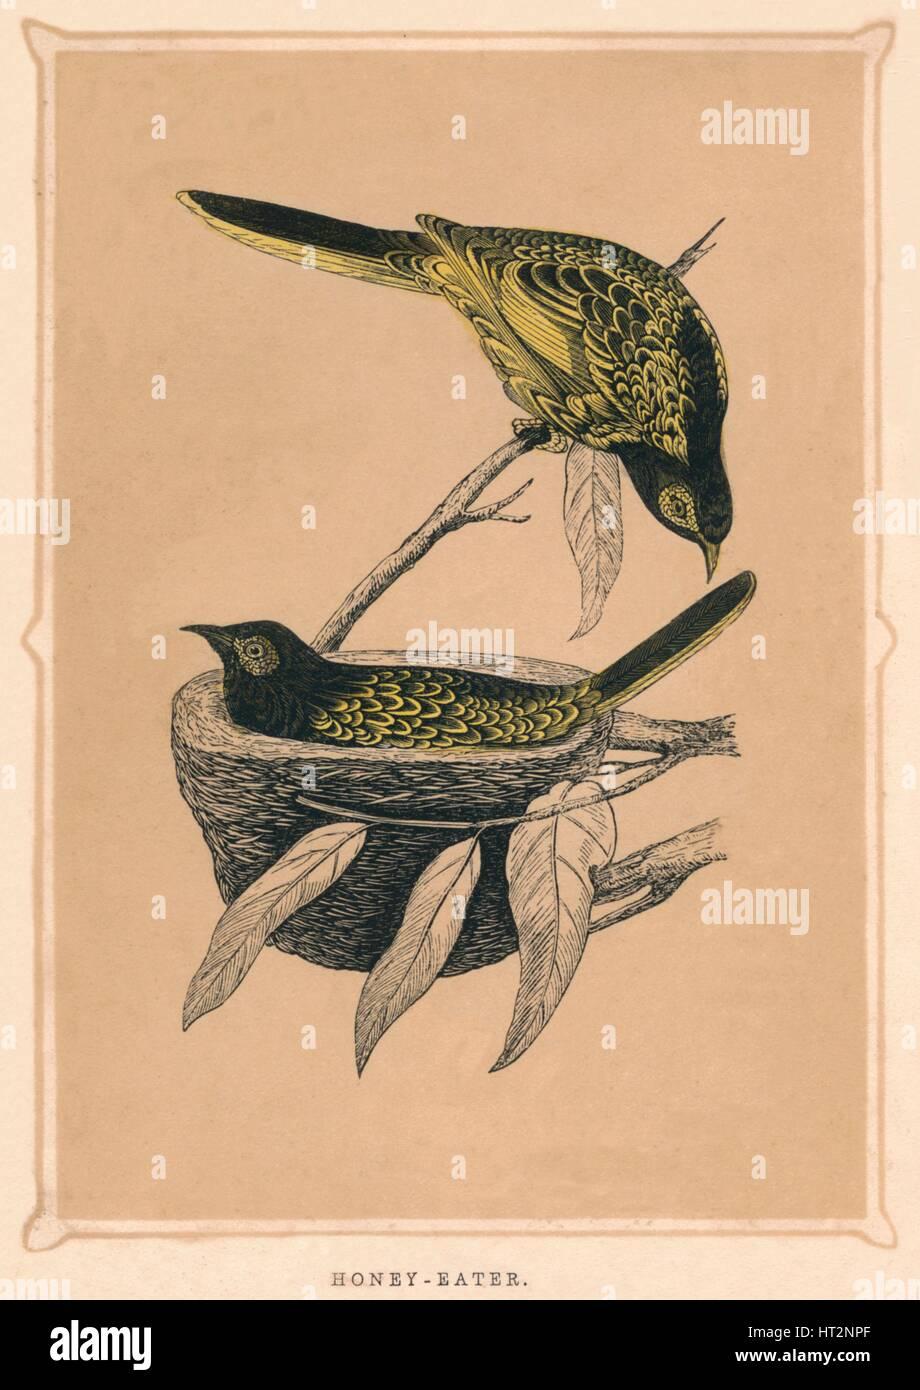 'Honey-Eater', (Meliphagidae), c1850, (1856). Artist: Unknown. - Stock Image